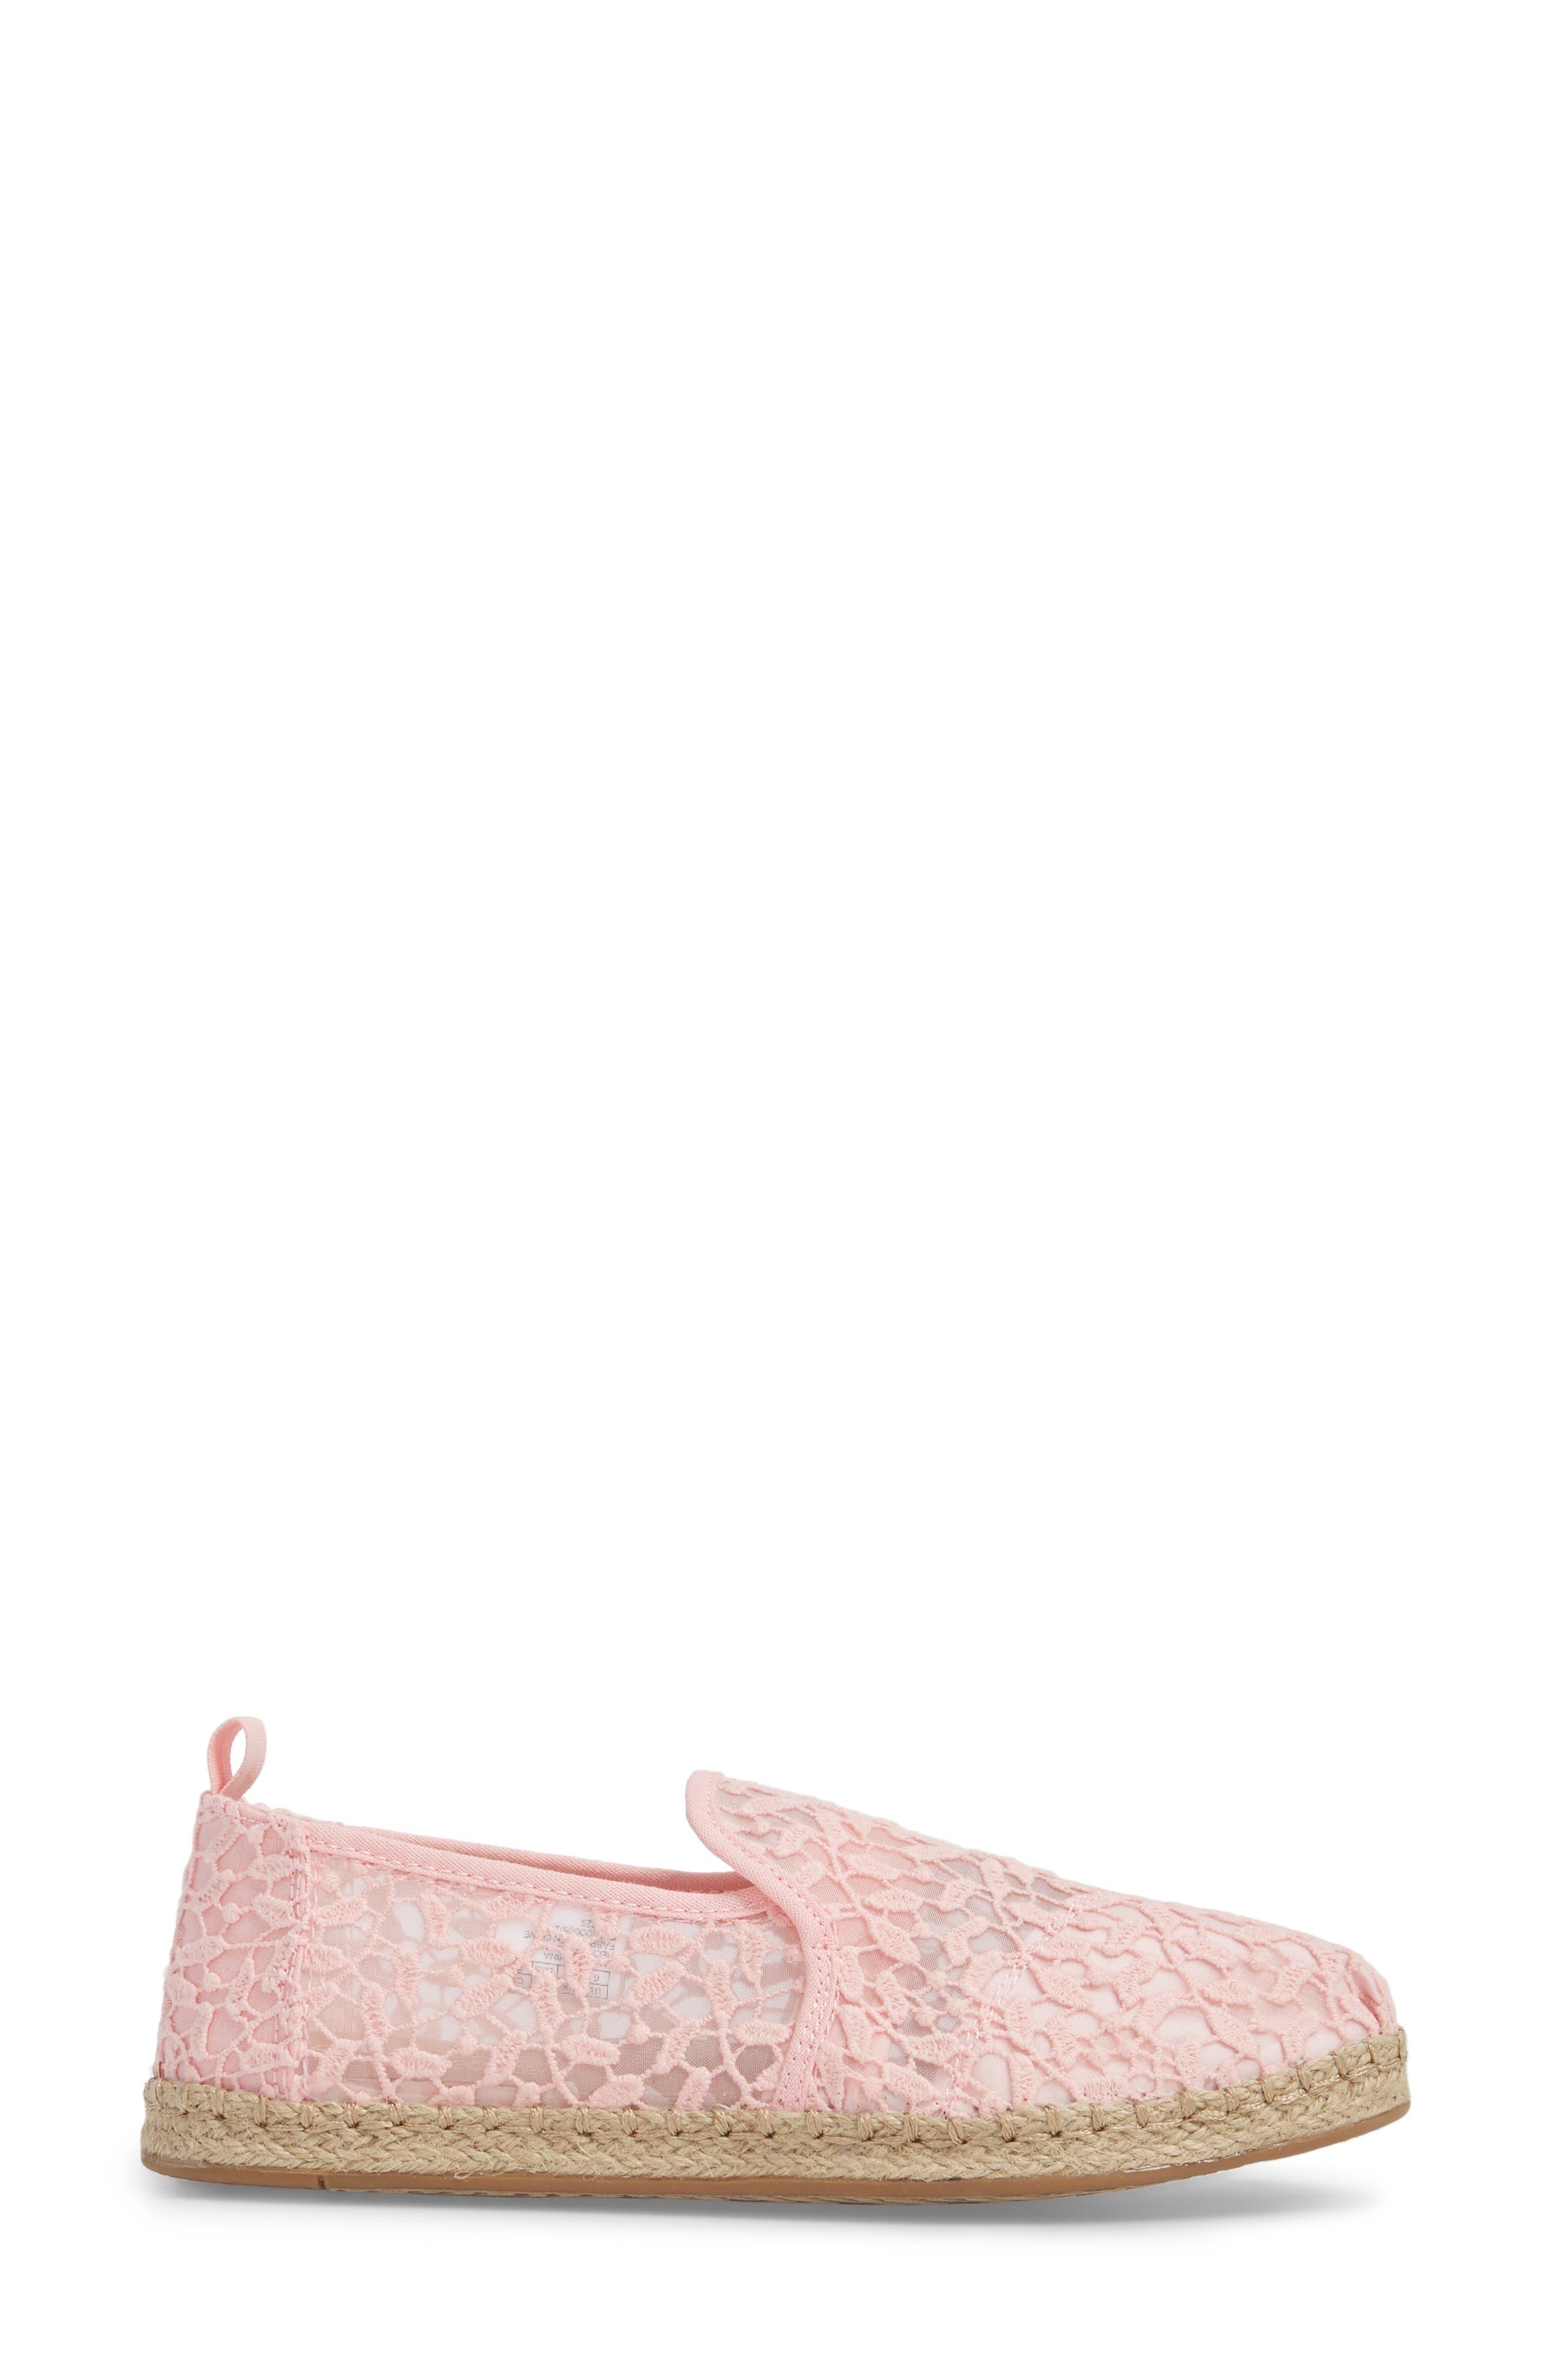 Deconstructed Alpargata Espadrille Slip-On,                             Alternate thumbnail 3, color,                             Blossom Lace Leaves